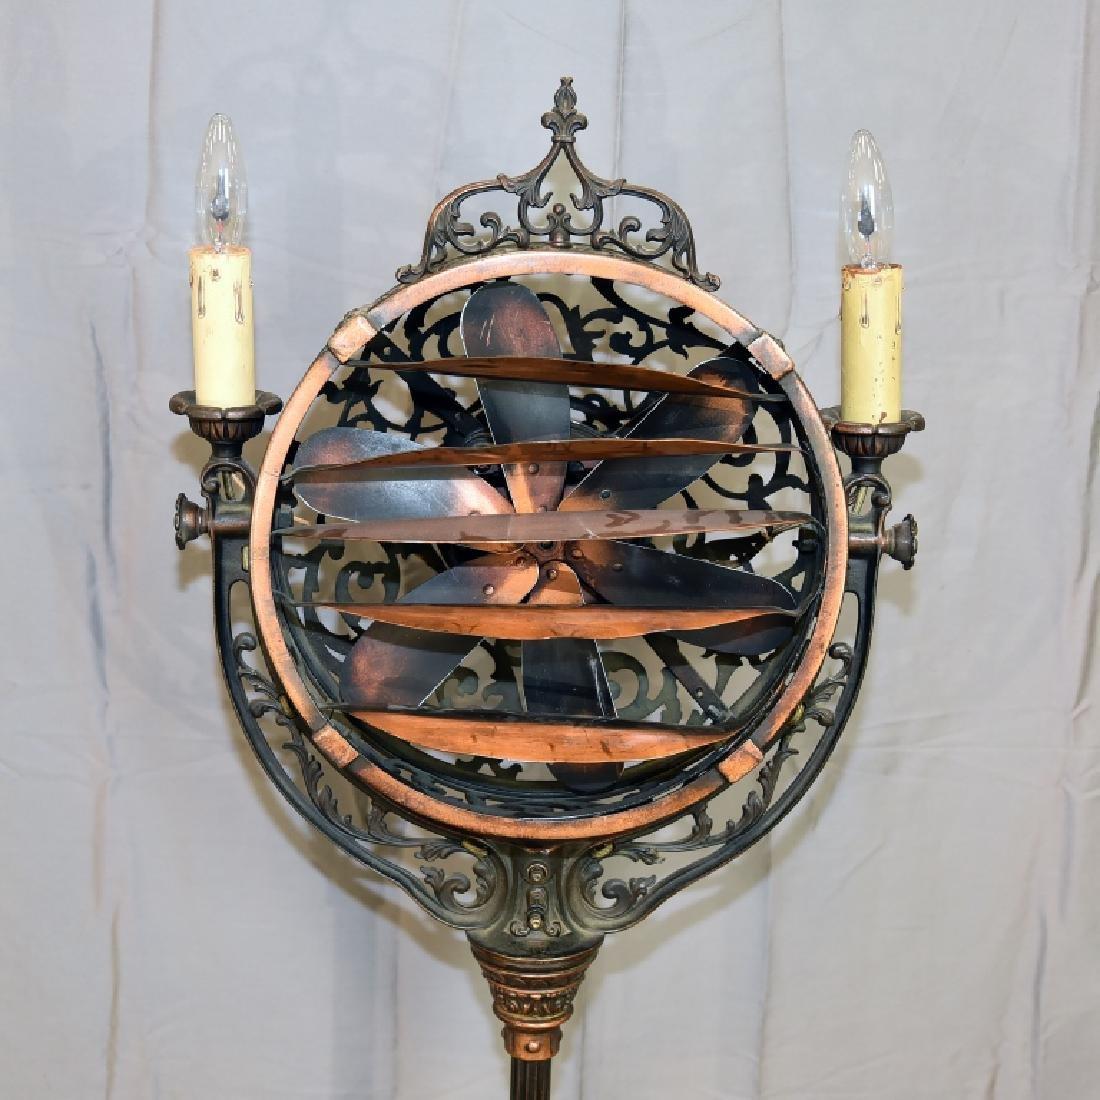 Circa 1920 Luminaire Parlor Floor Fan - 2